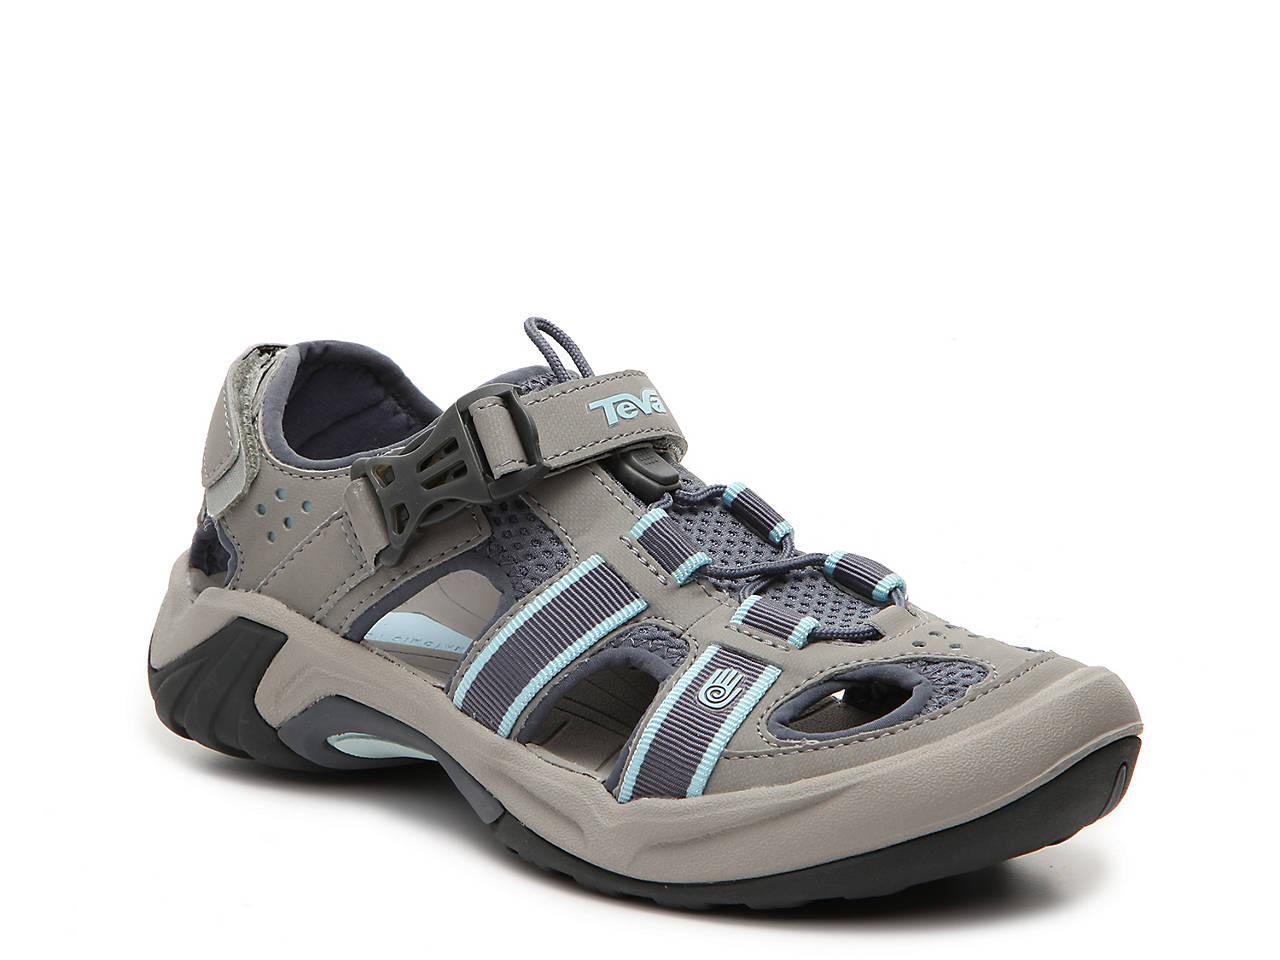 0aec65f2543d Teva Omnium Sport Sandal Women s Shoes